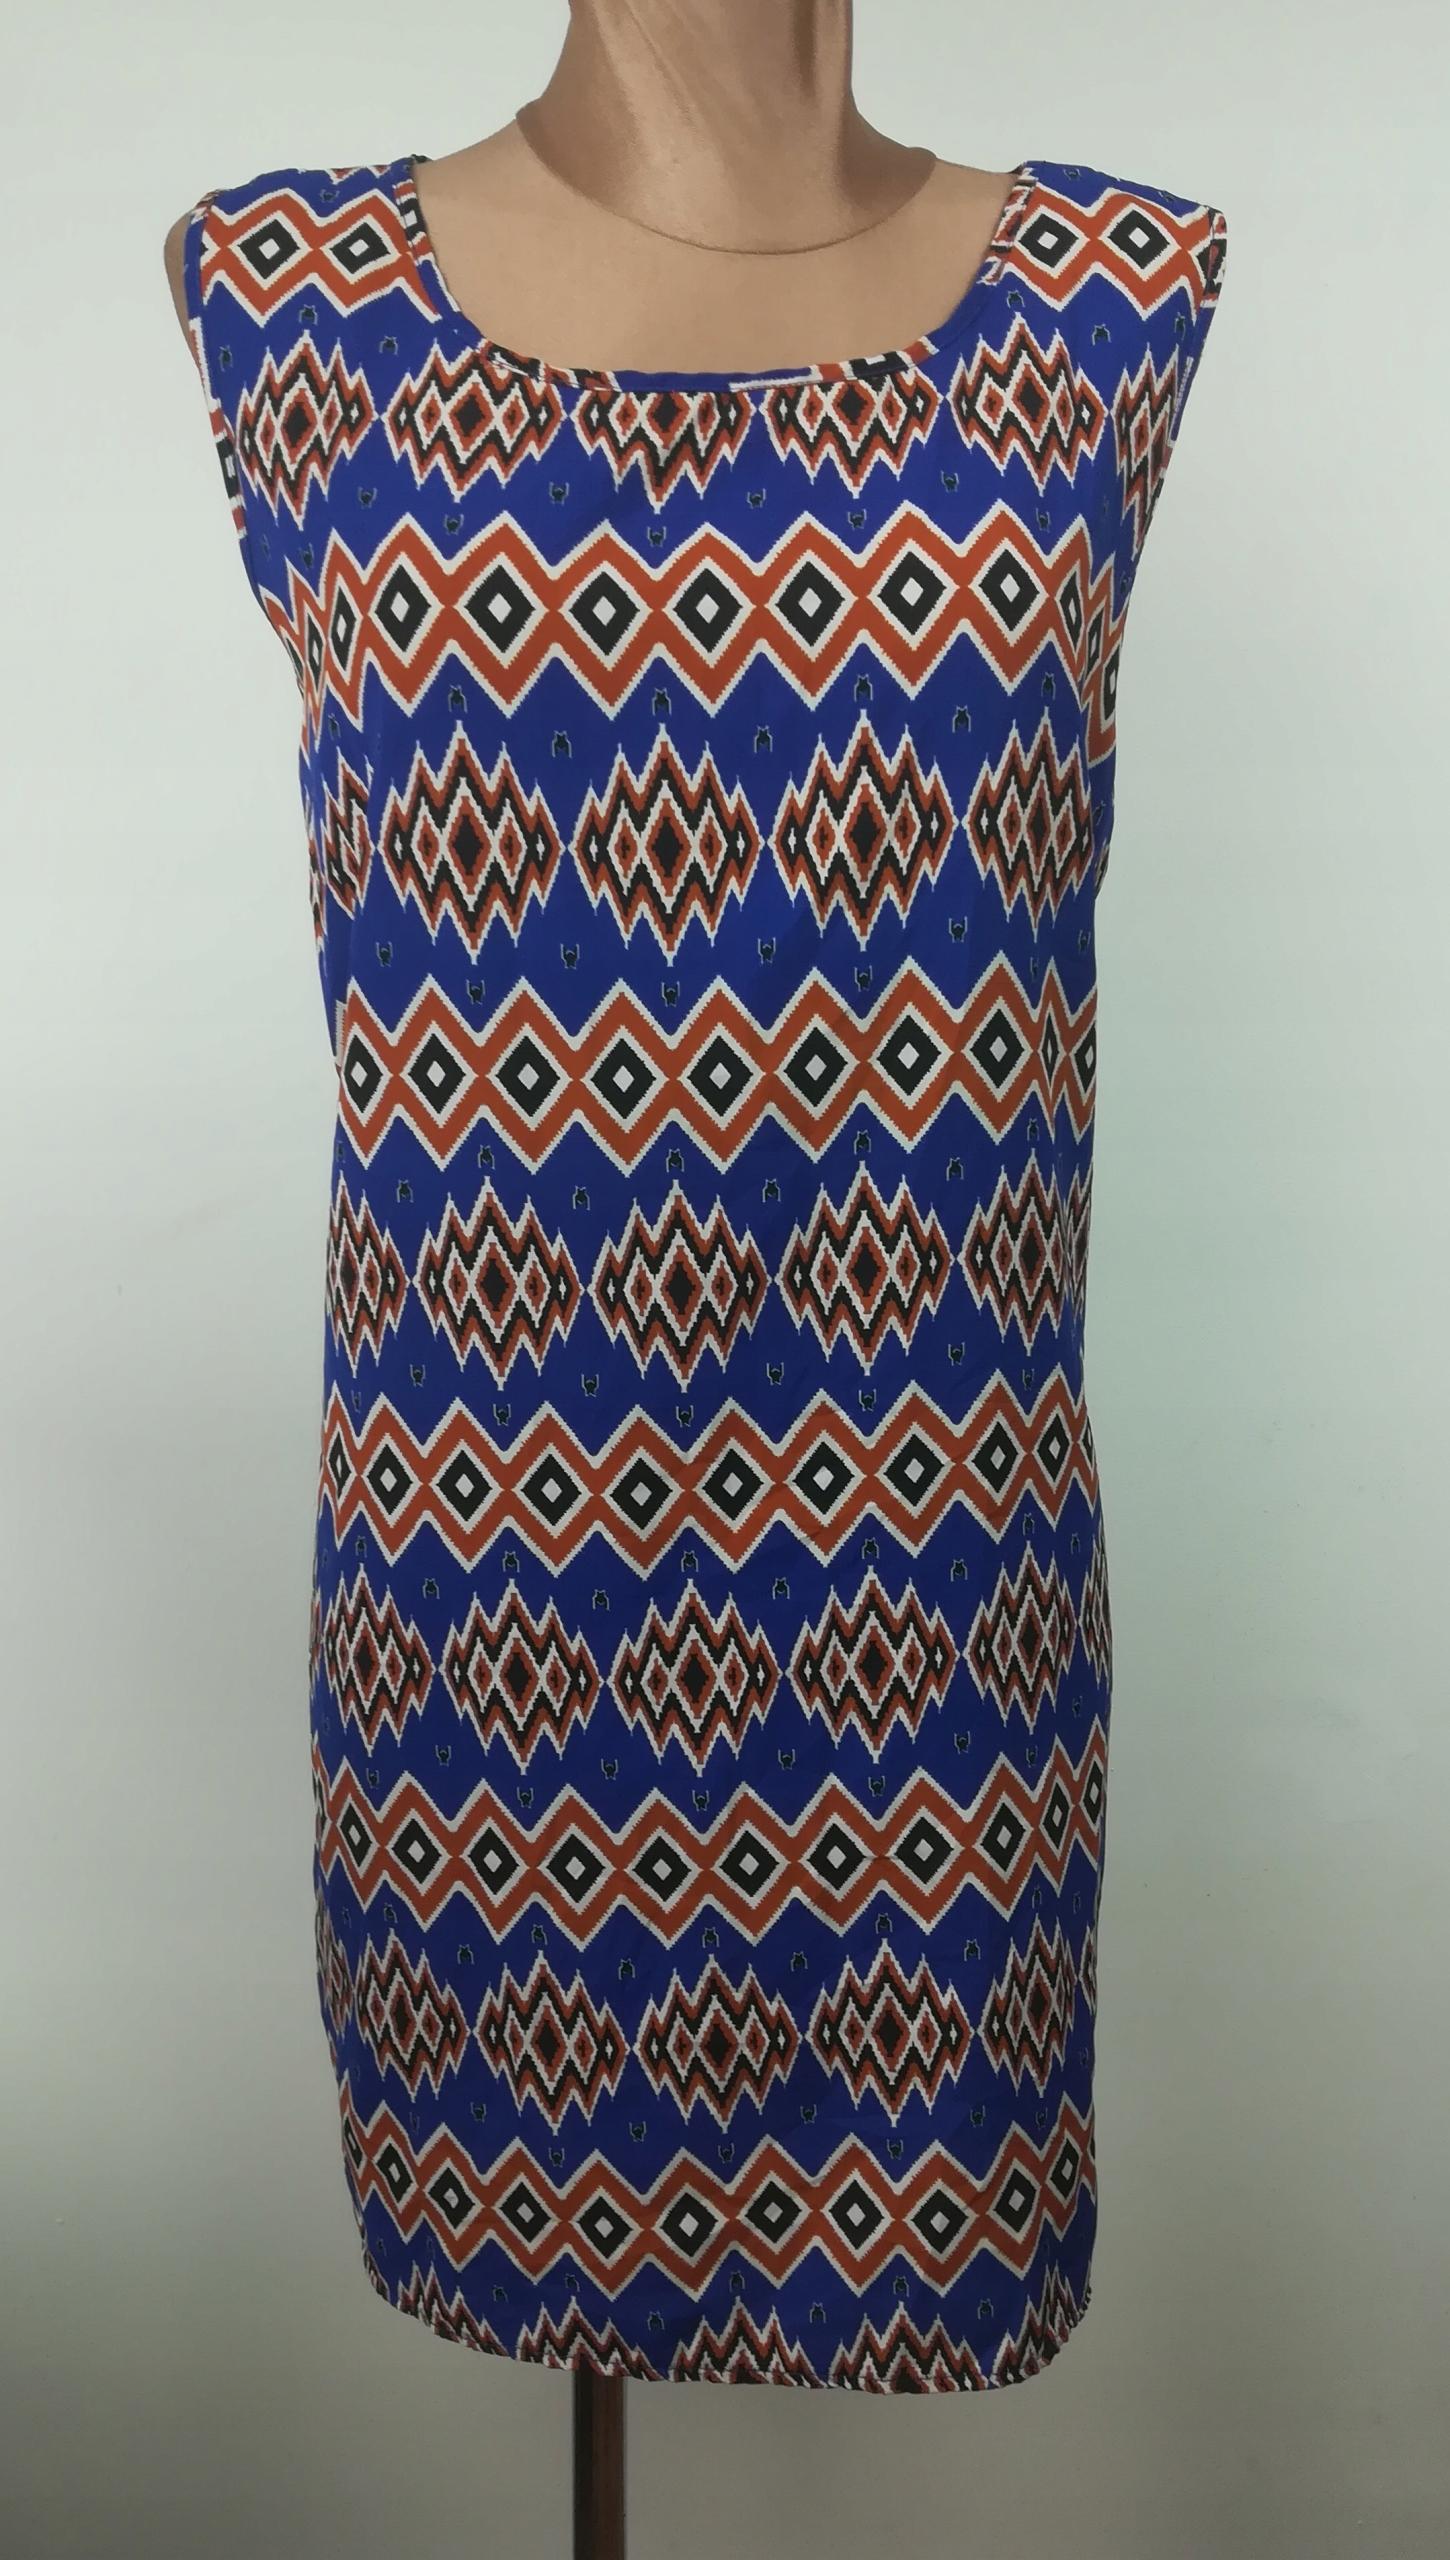 sukienka BOOHOO ASOS elegancka klasyczna wzory 40